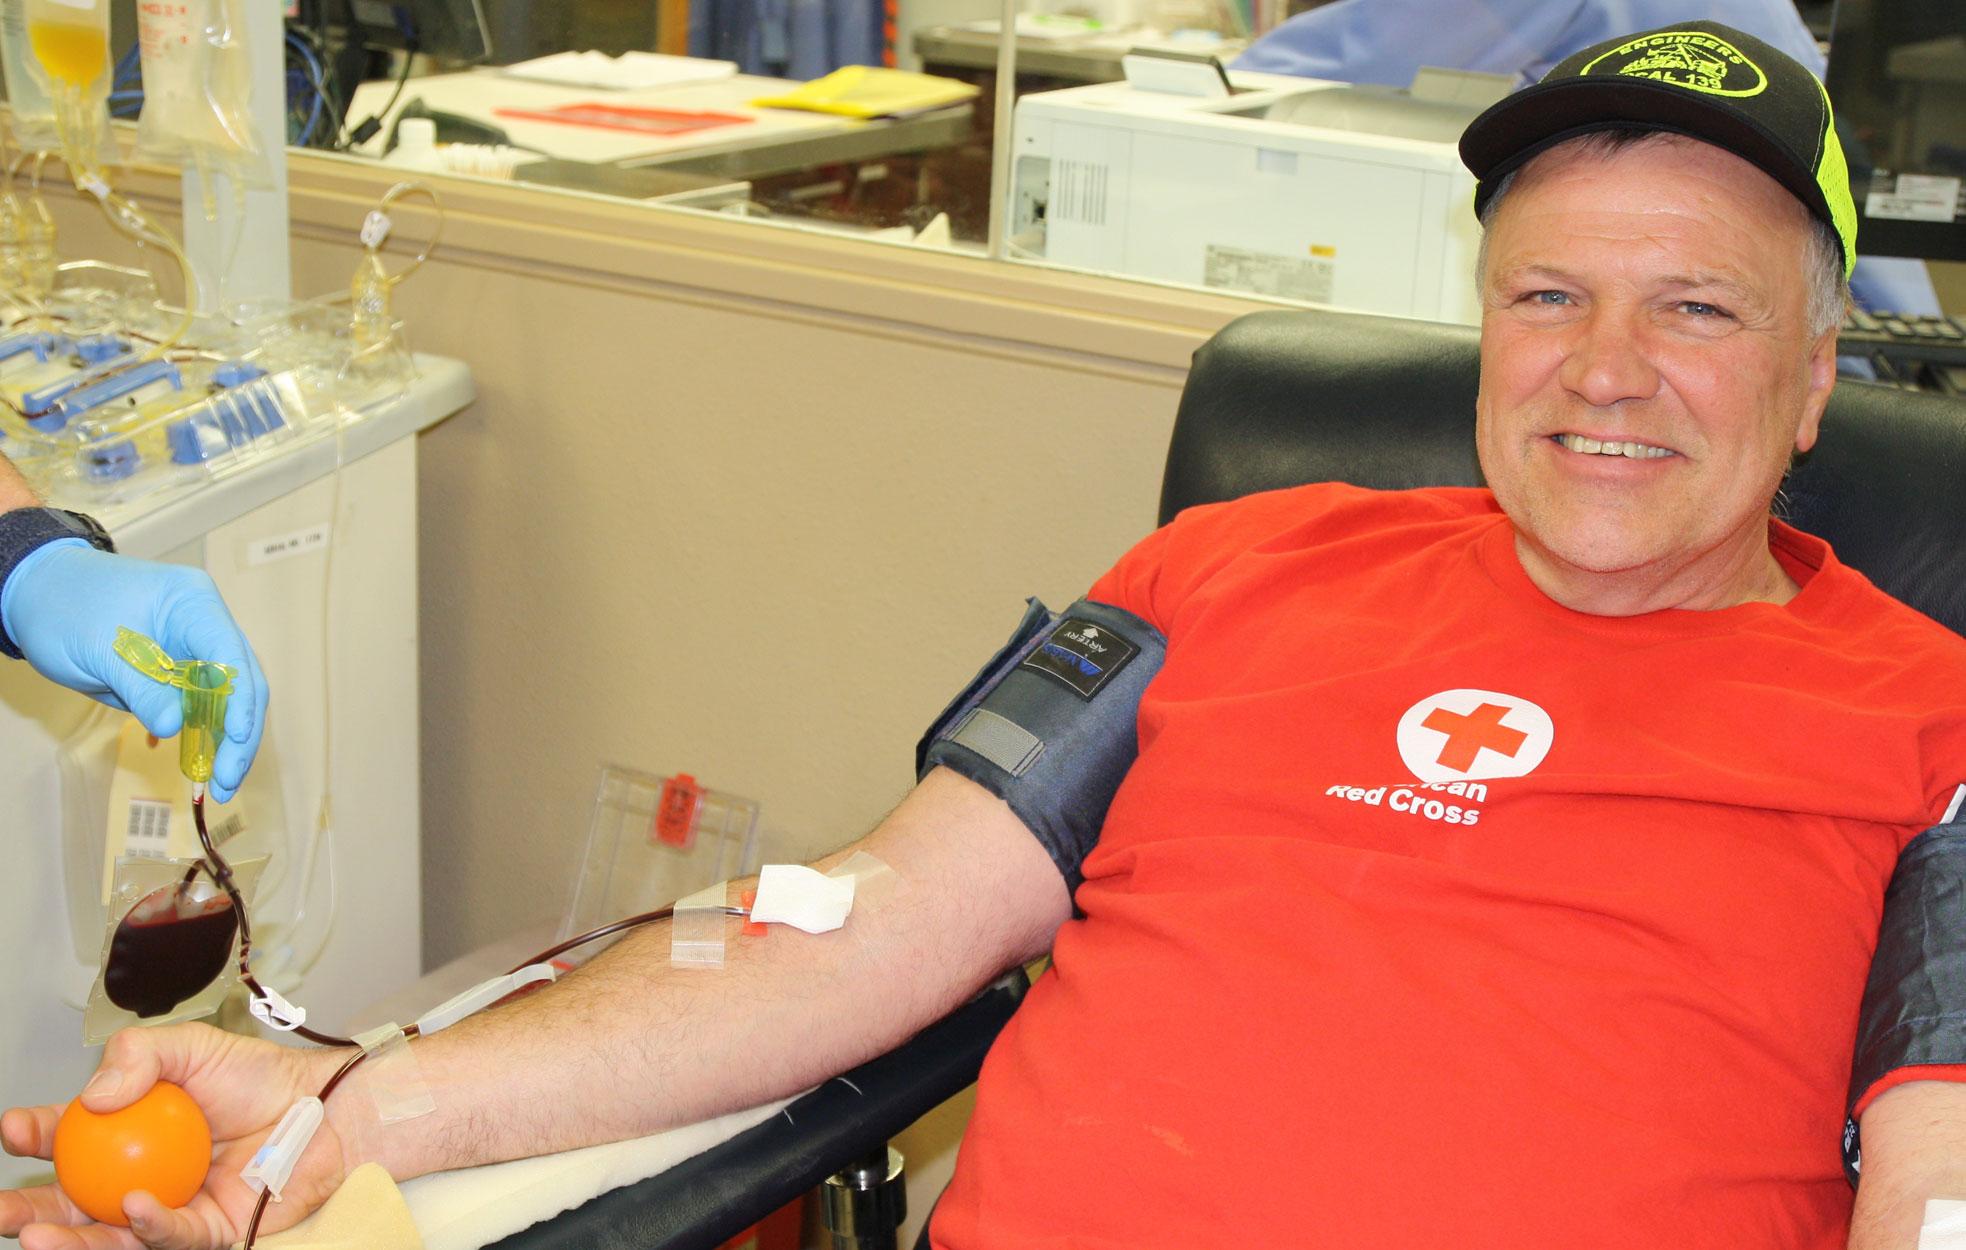 Brad Morter donating blood